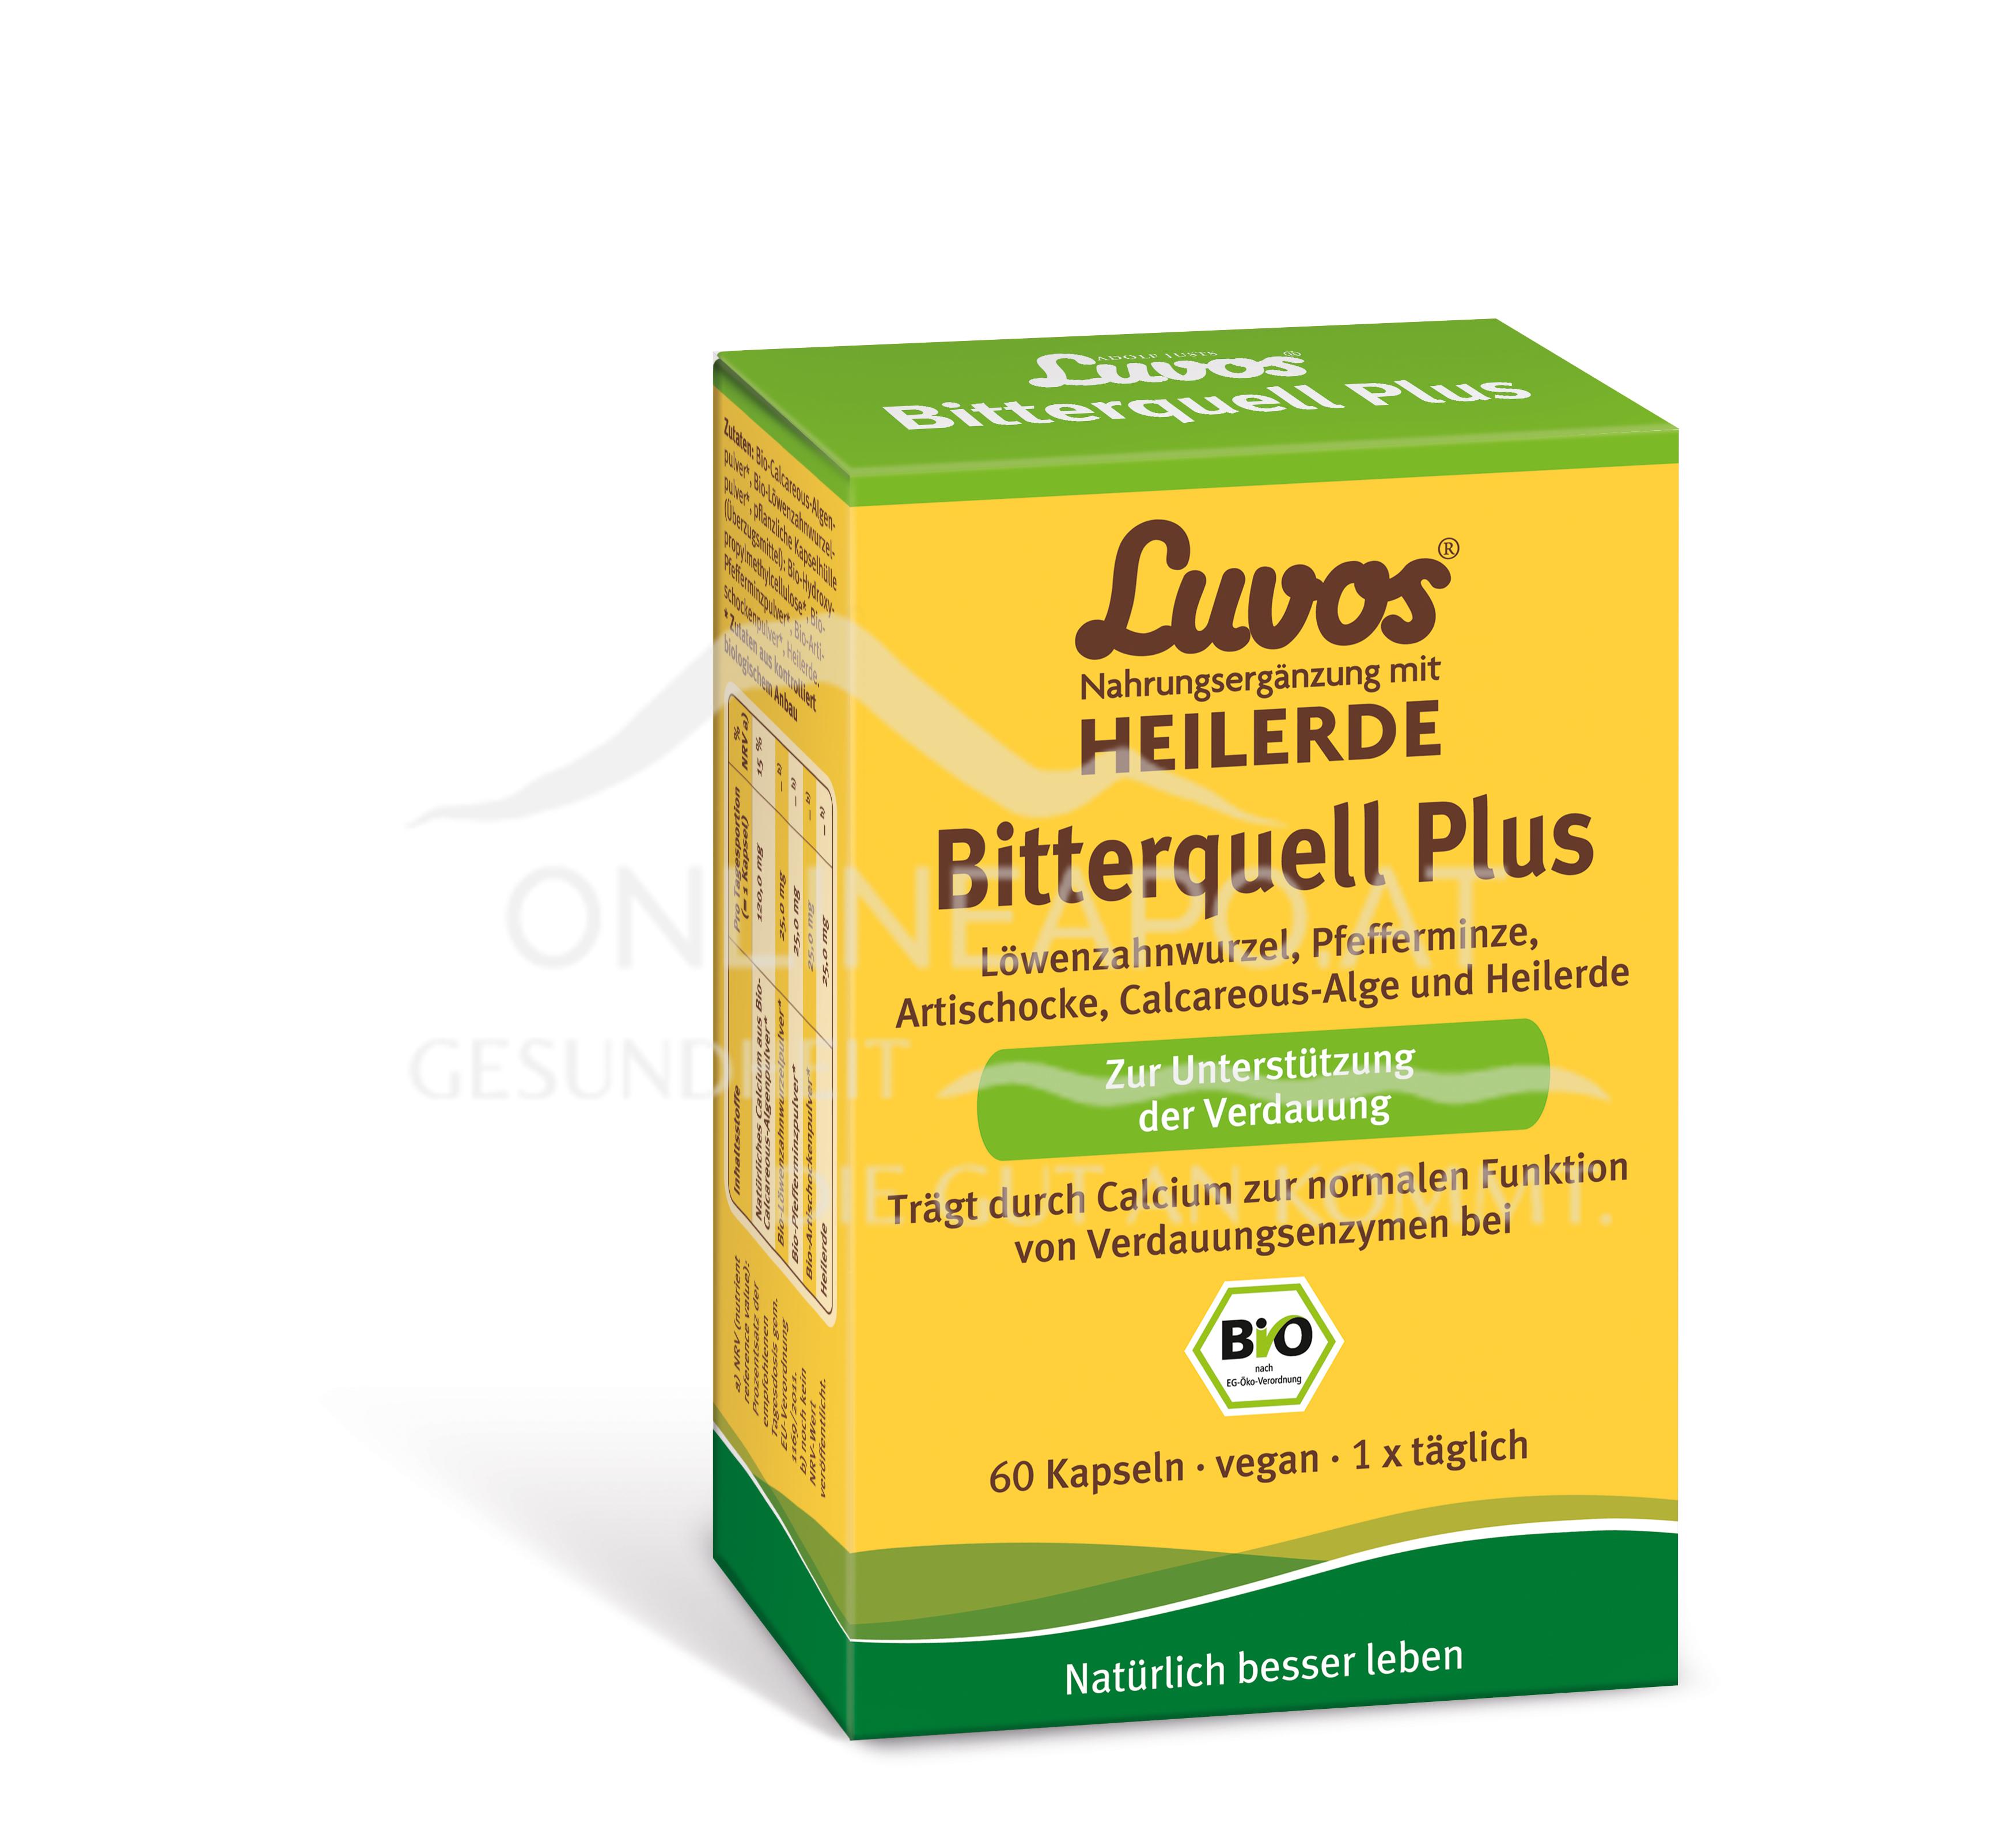 LUVOS Kapseln Bitterquell Plus